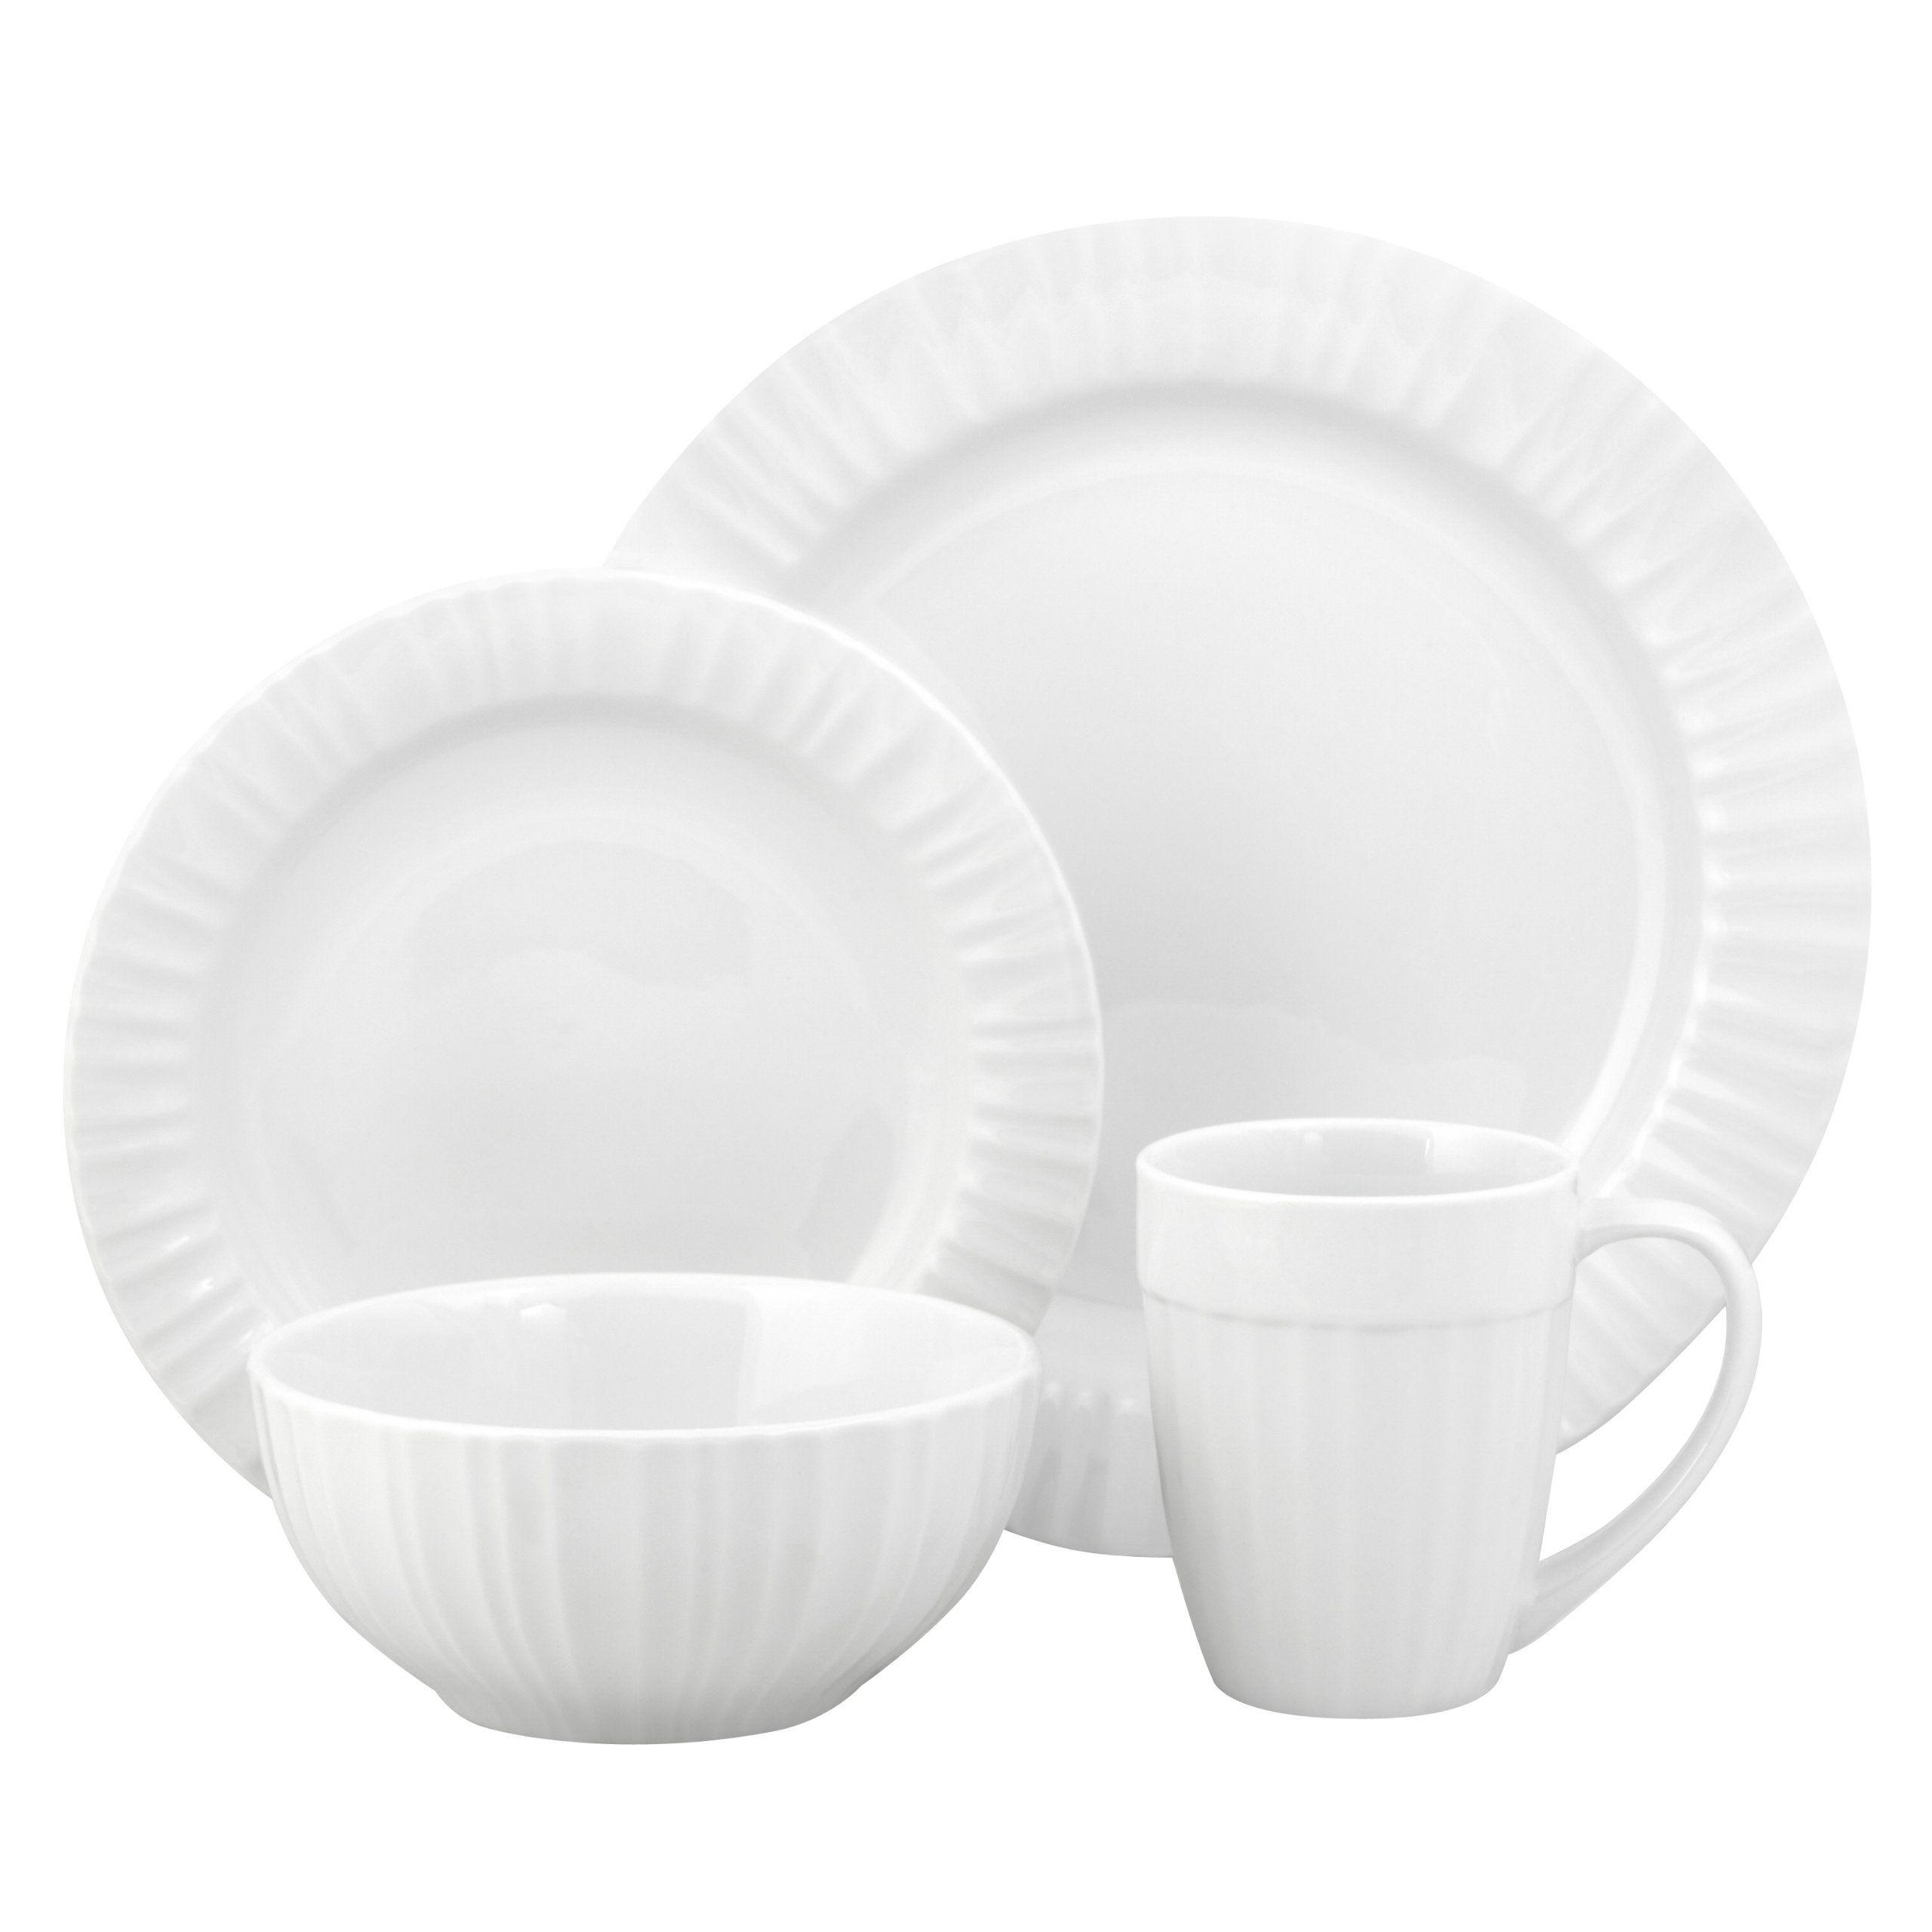 Amazon.com Corningware French White 16-Piece Bakeware Set Service for 4  sc 1 st  Pinterest & Amazon.com: Corningware French White 16-Piece Bakeware Set Service ...